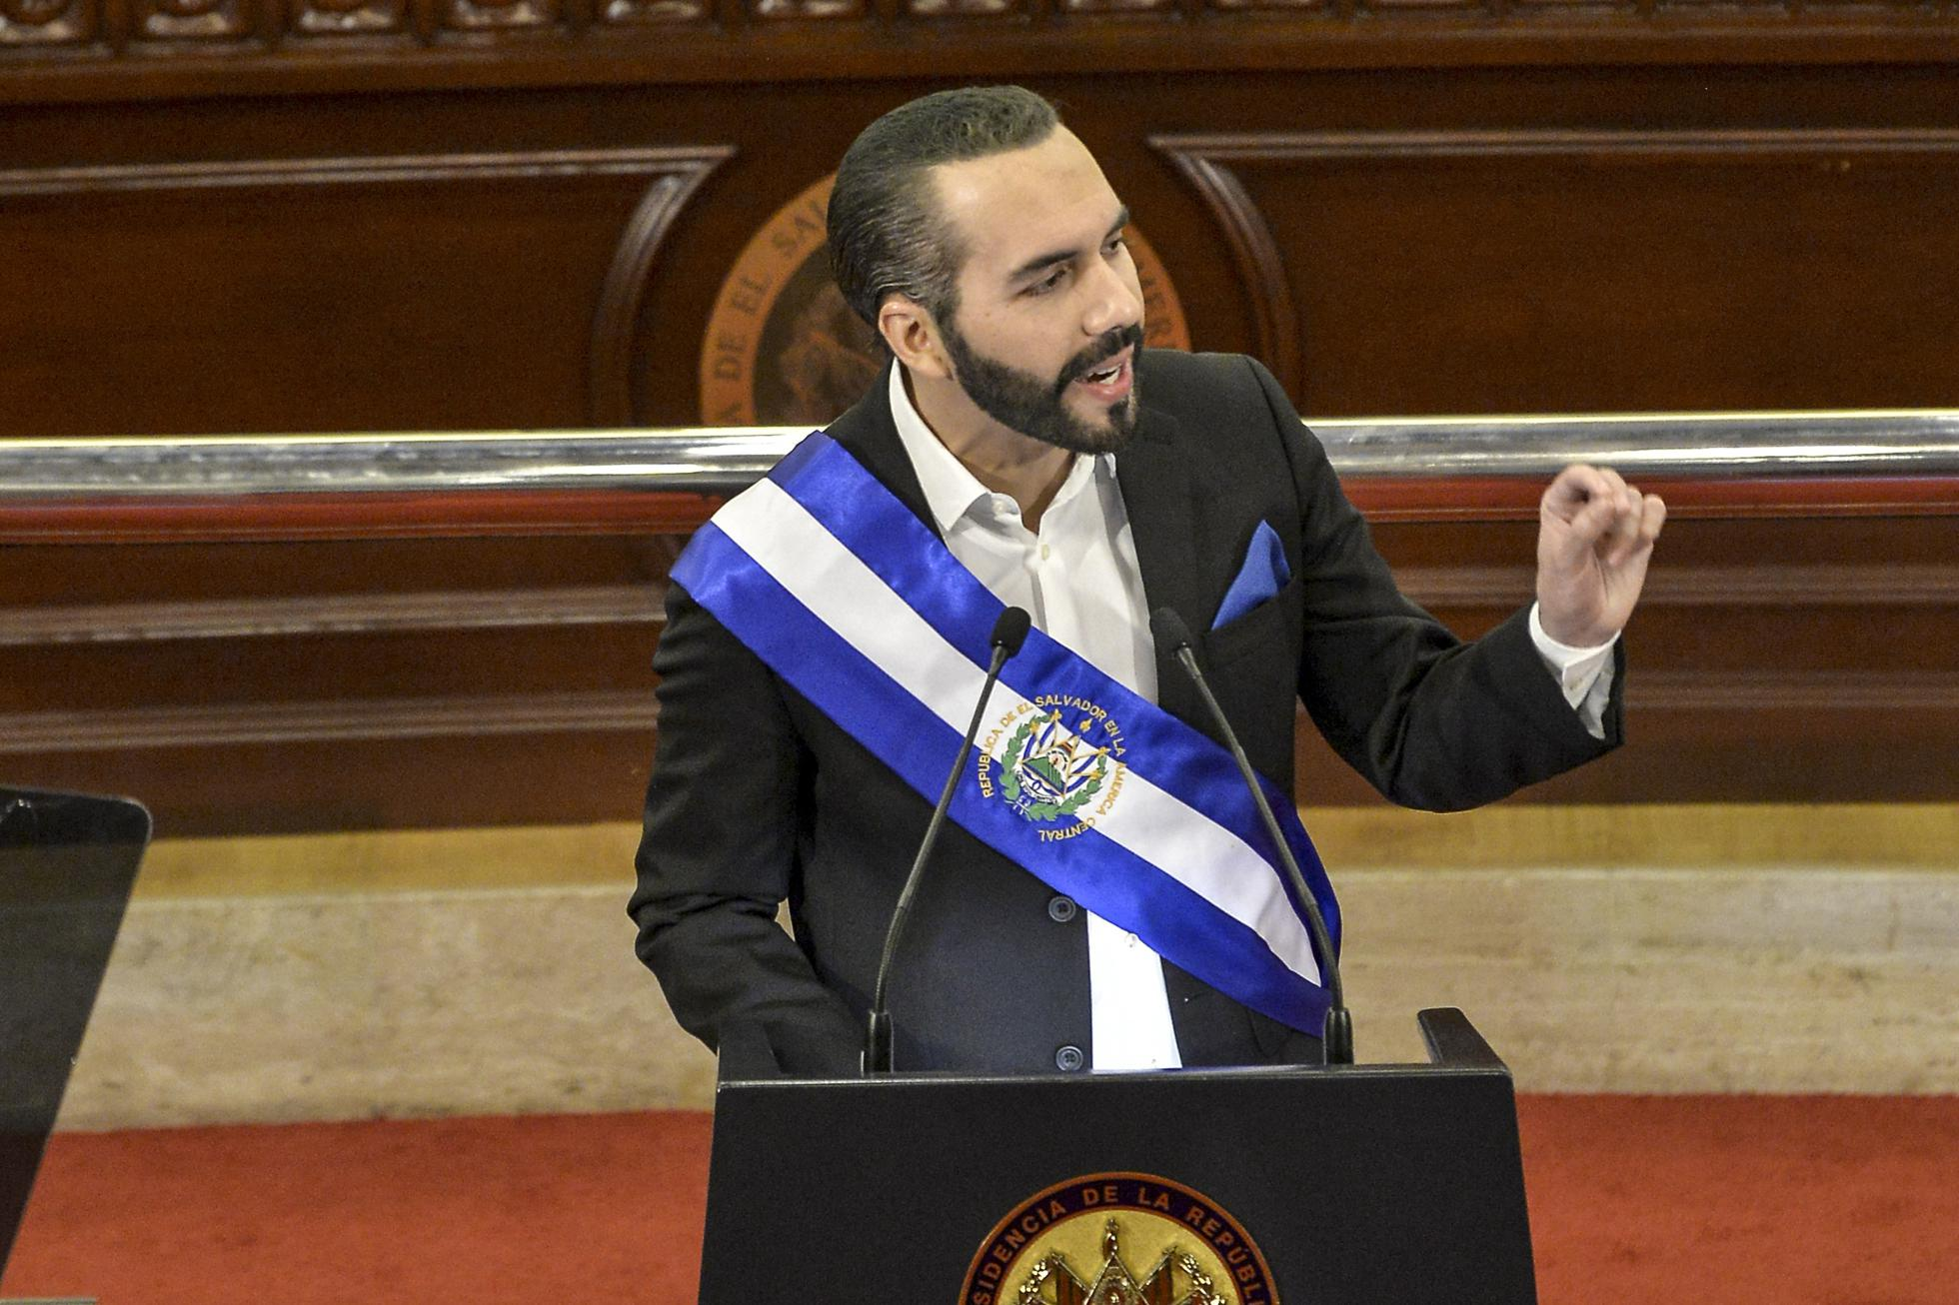 El Salvador president Nayib Bukele